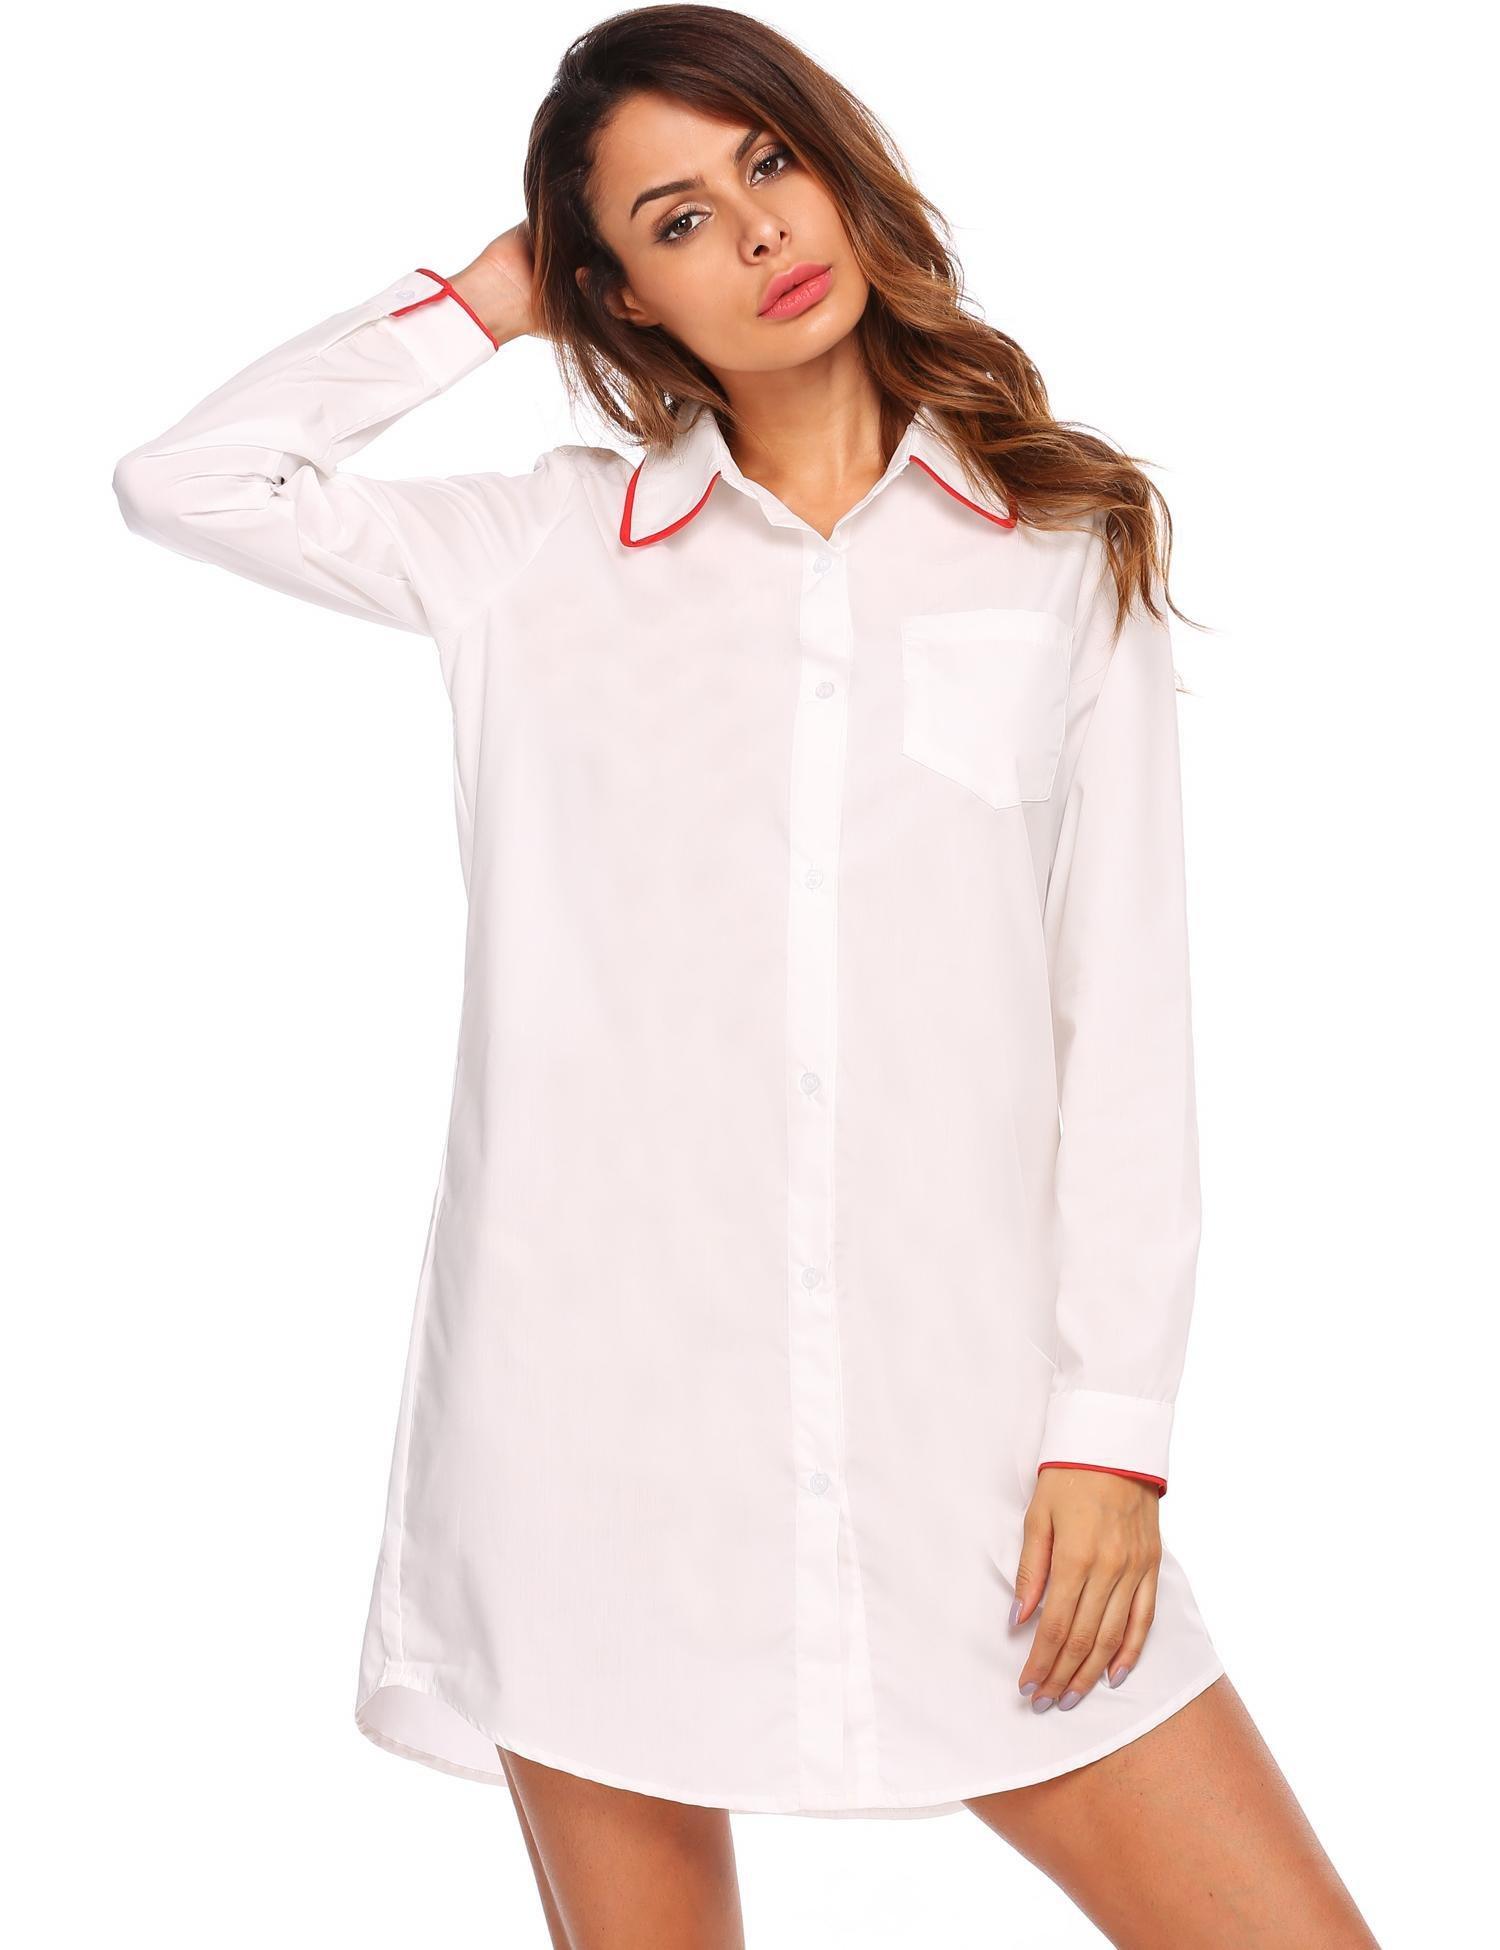 Goldenfox Boyfriend Style Sleep Shirt For Women Sexy Lon Sleeve Pajamas (White,Large)